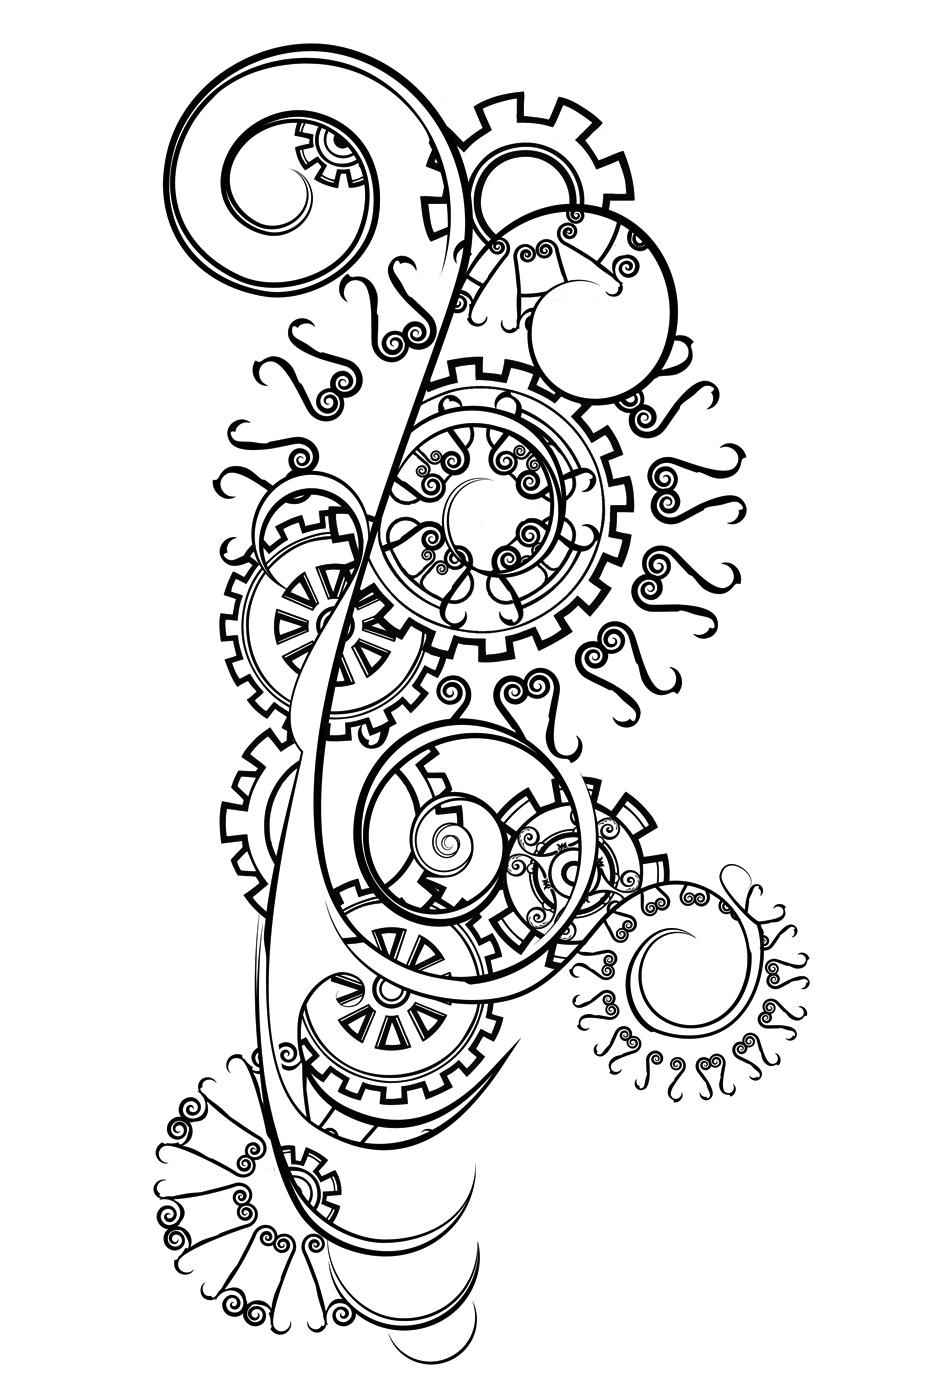 A Wolf Illustrations Blog: Tattoo Design